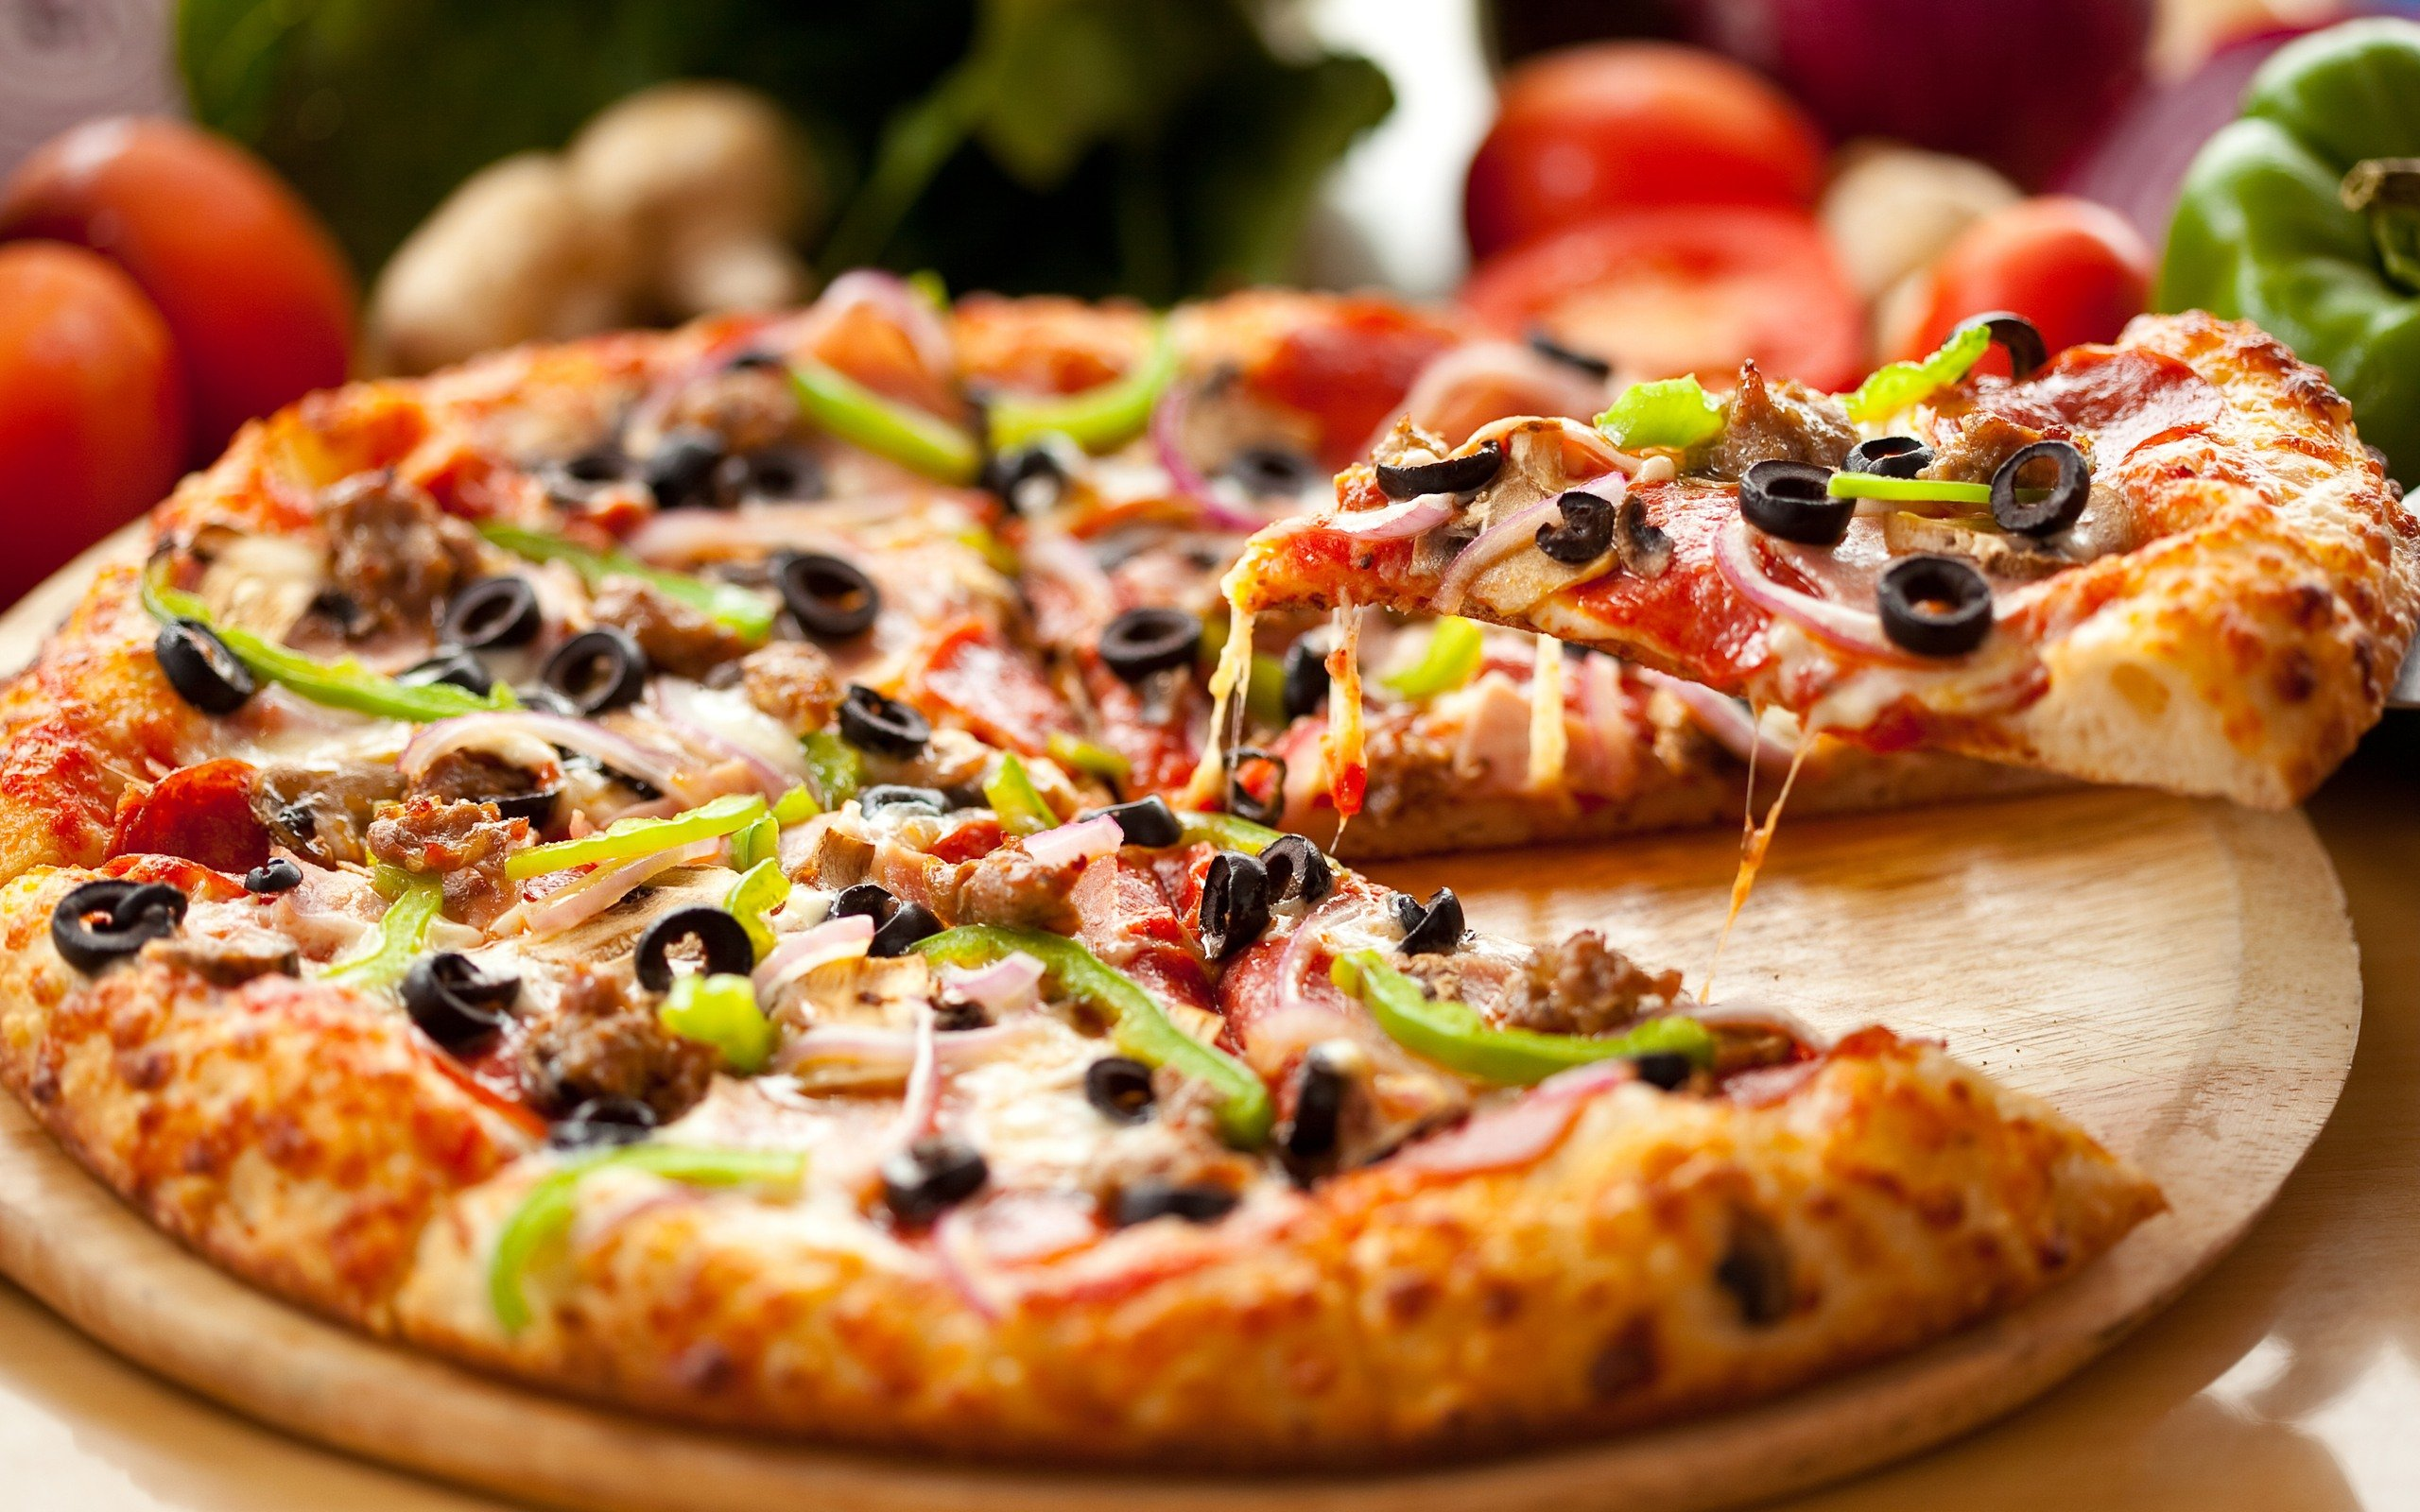 A plato lleno masa de pizza casera for Platos de pizza